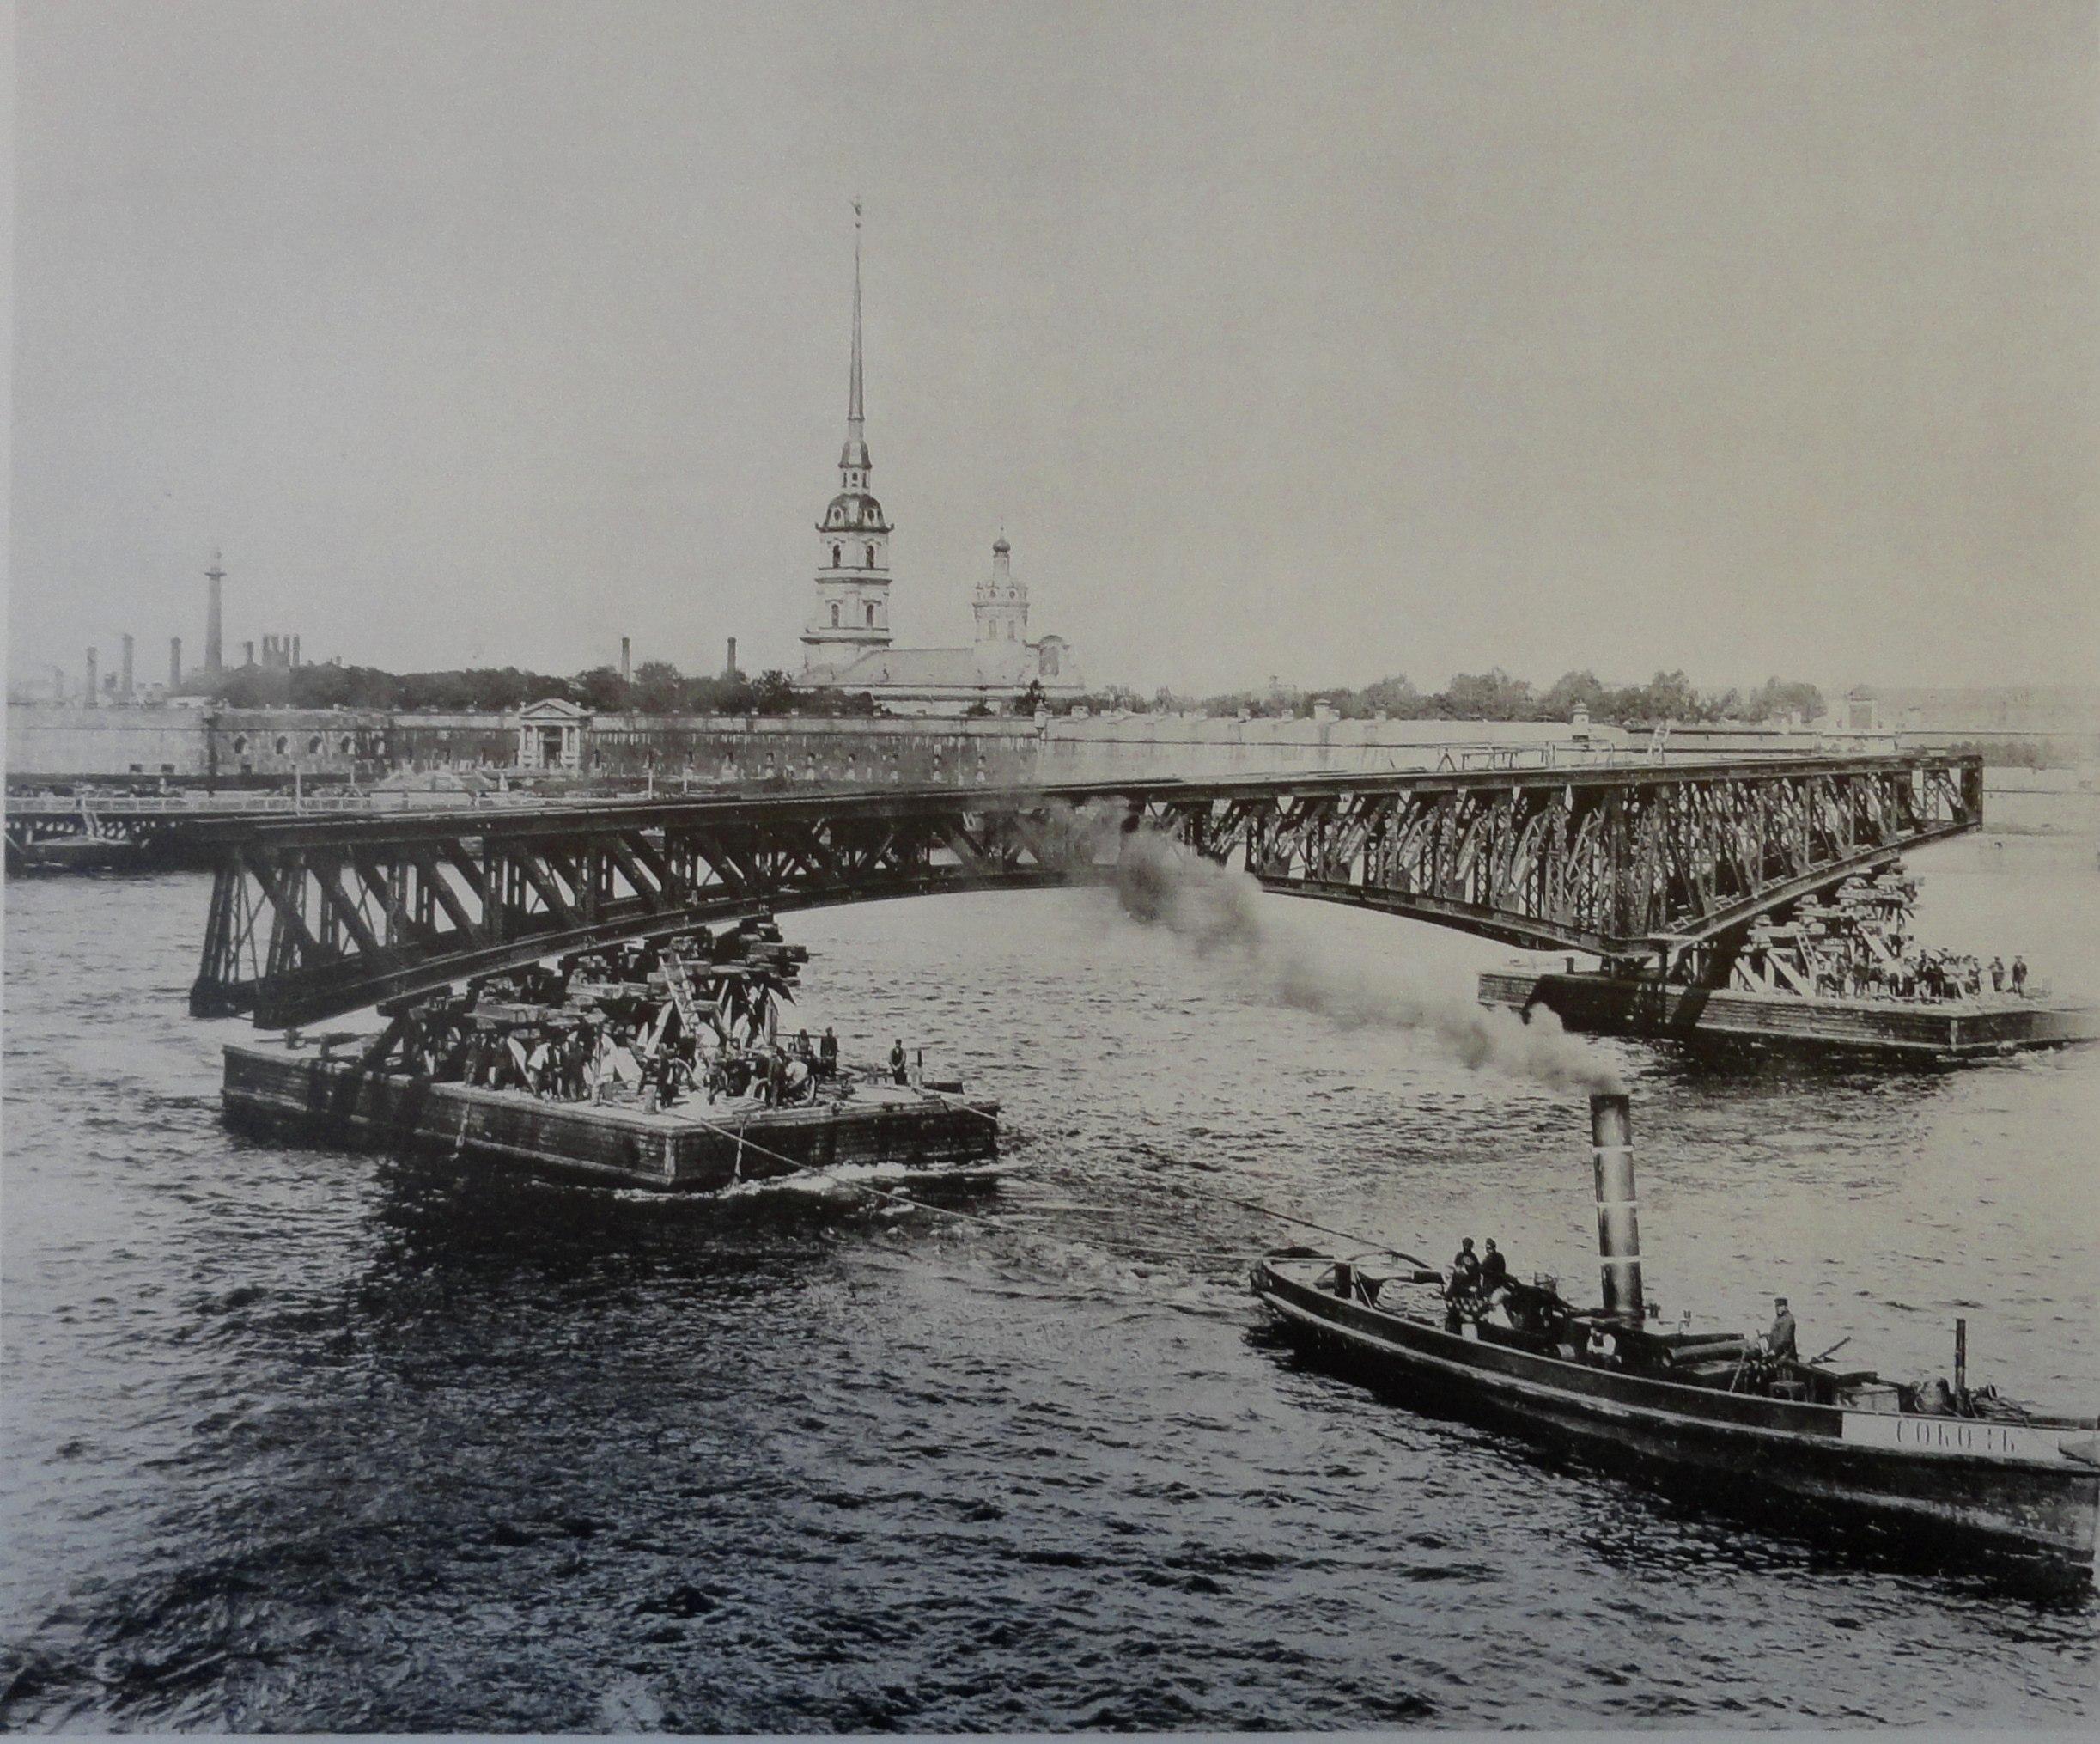 1901. Перевозка ферм левого крайнего пролета. 27 июня